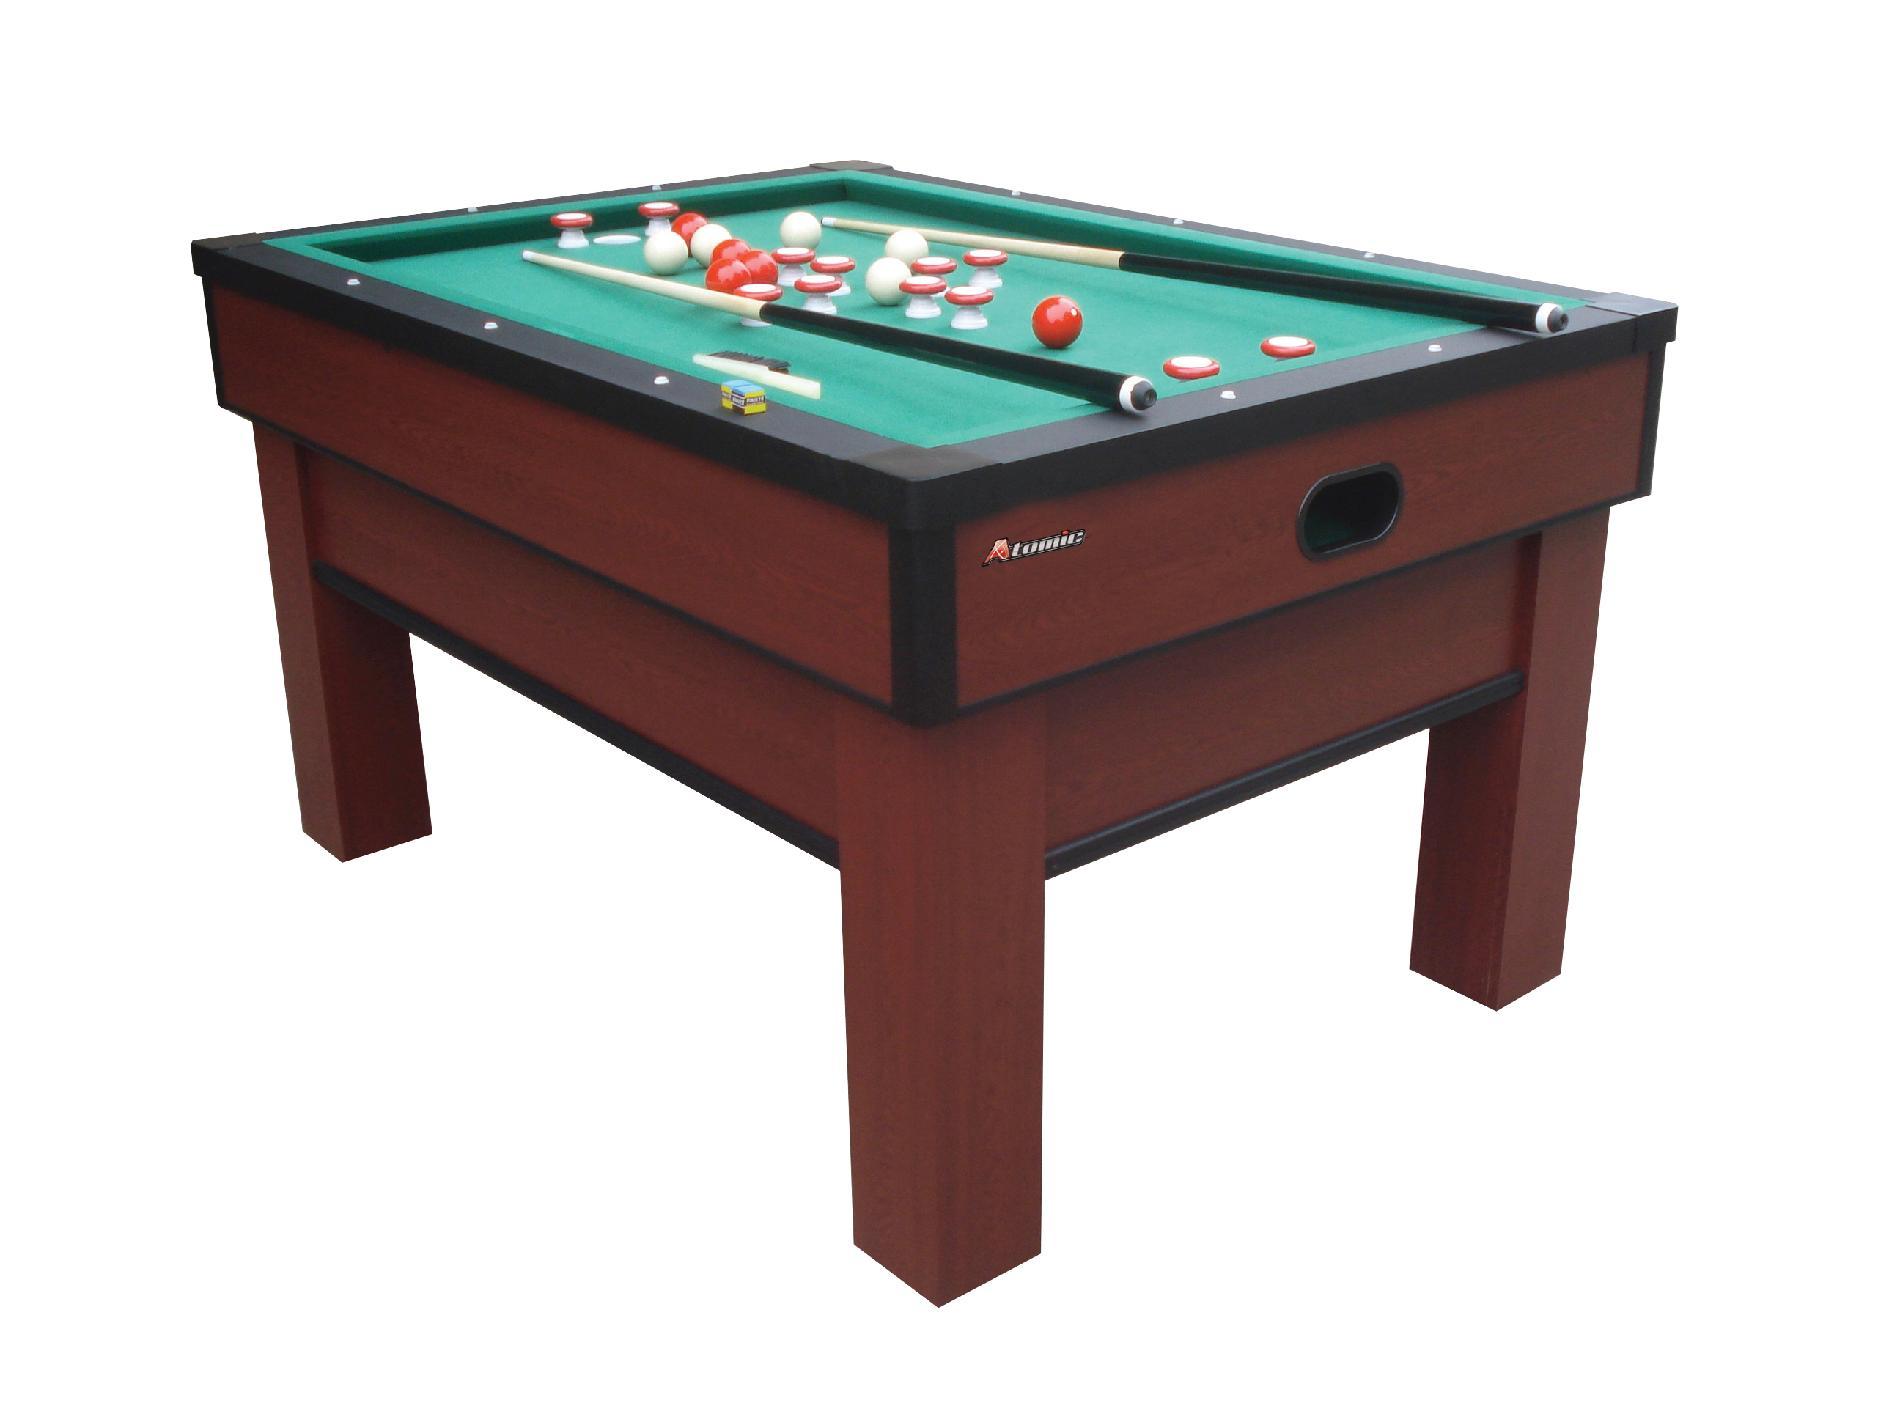 Rhino Bumper Pool Table